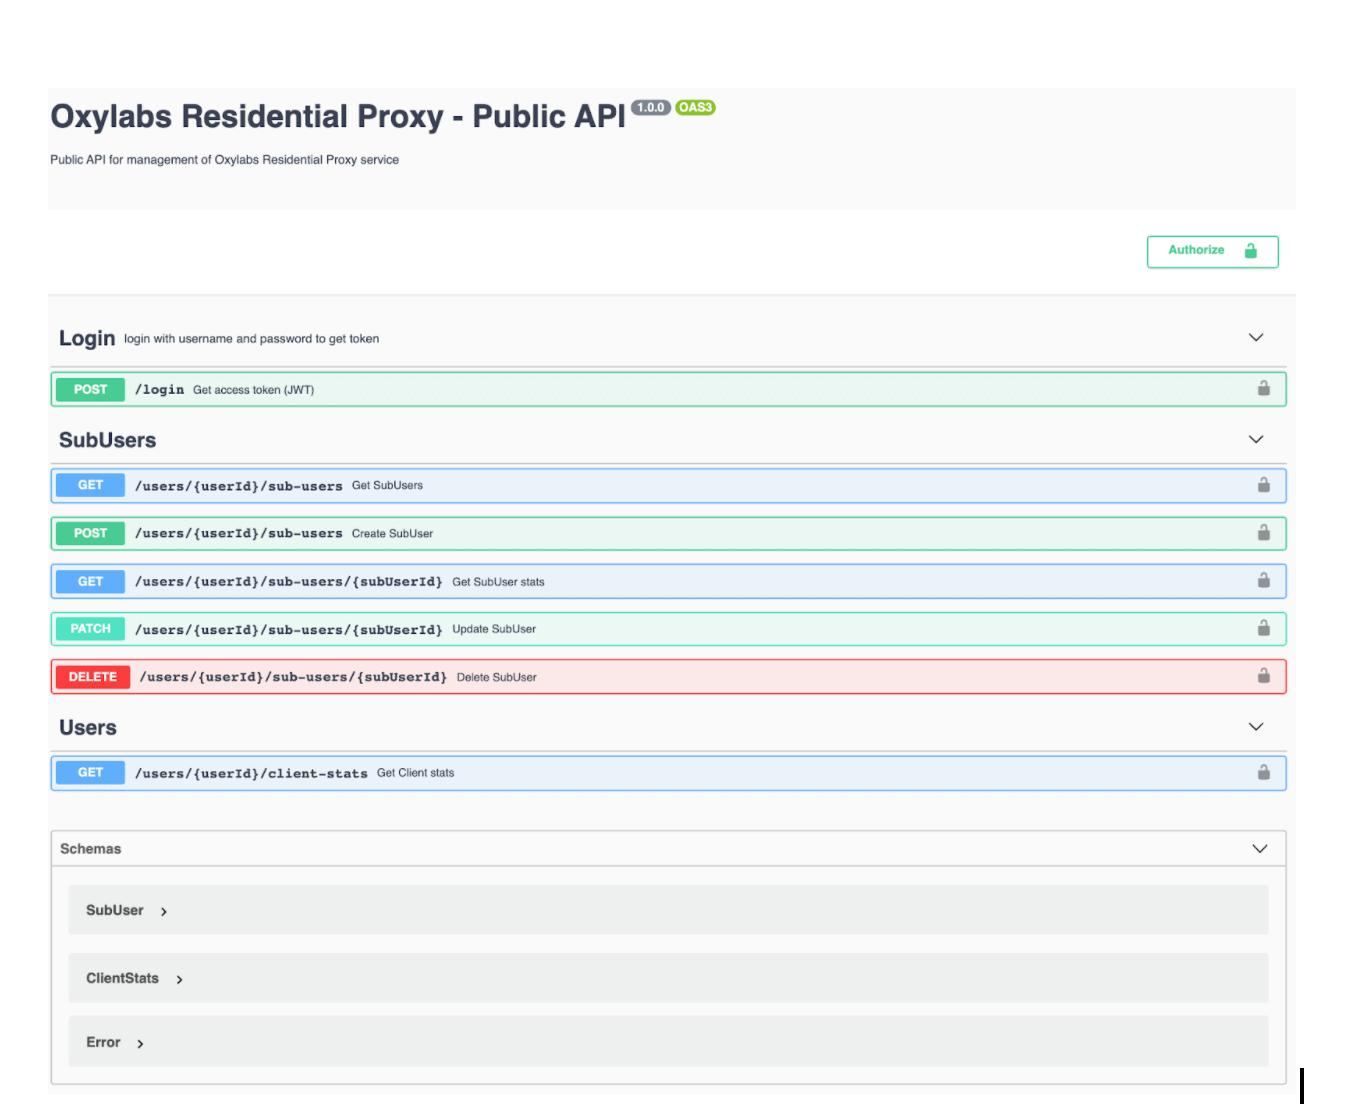 Oxylabs public API